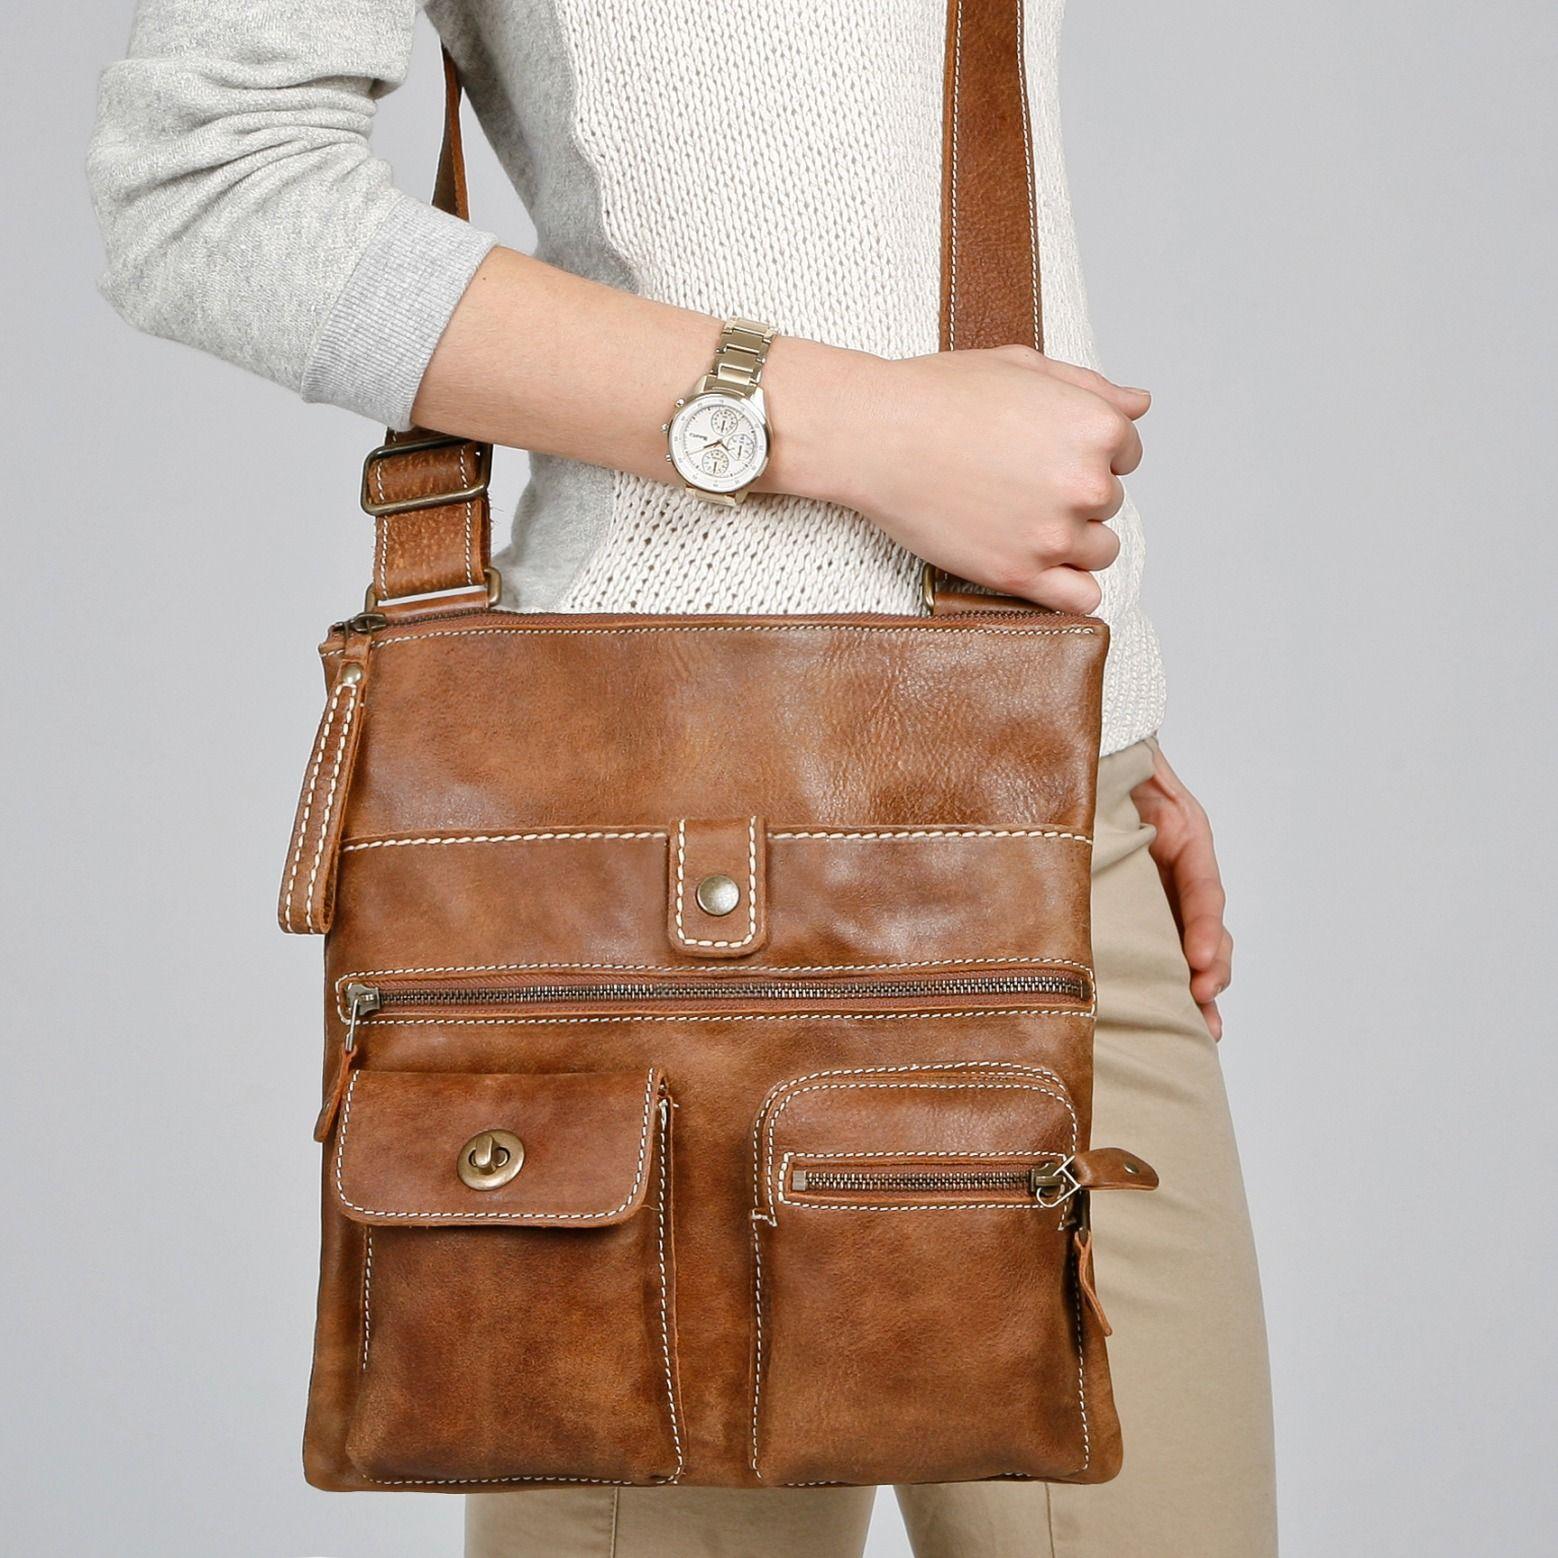 Venetian Village Bag | Roots Original Flat Bags | My Style ...